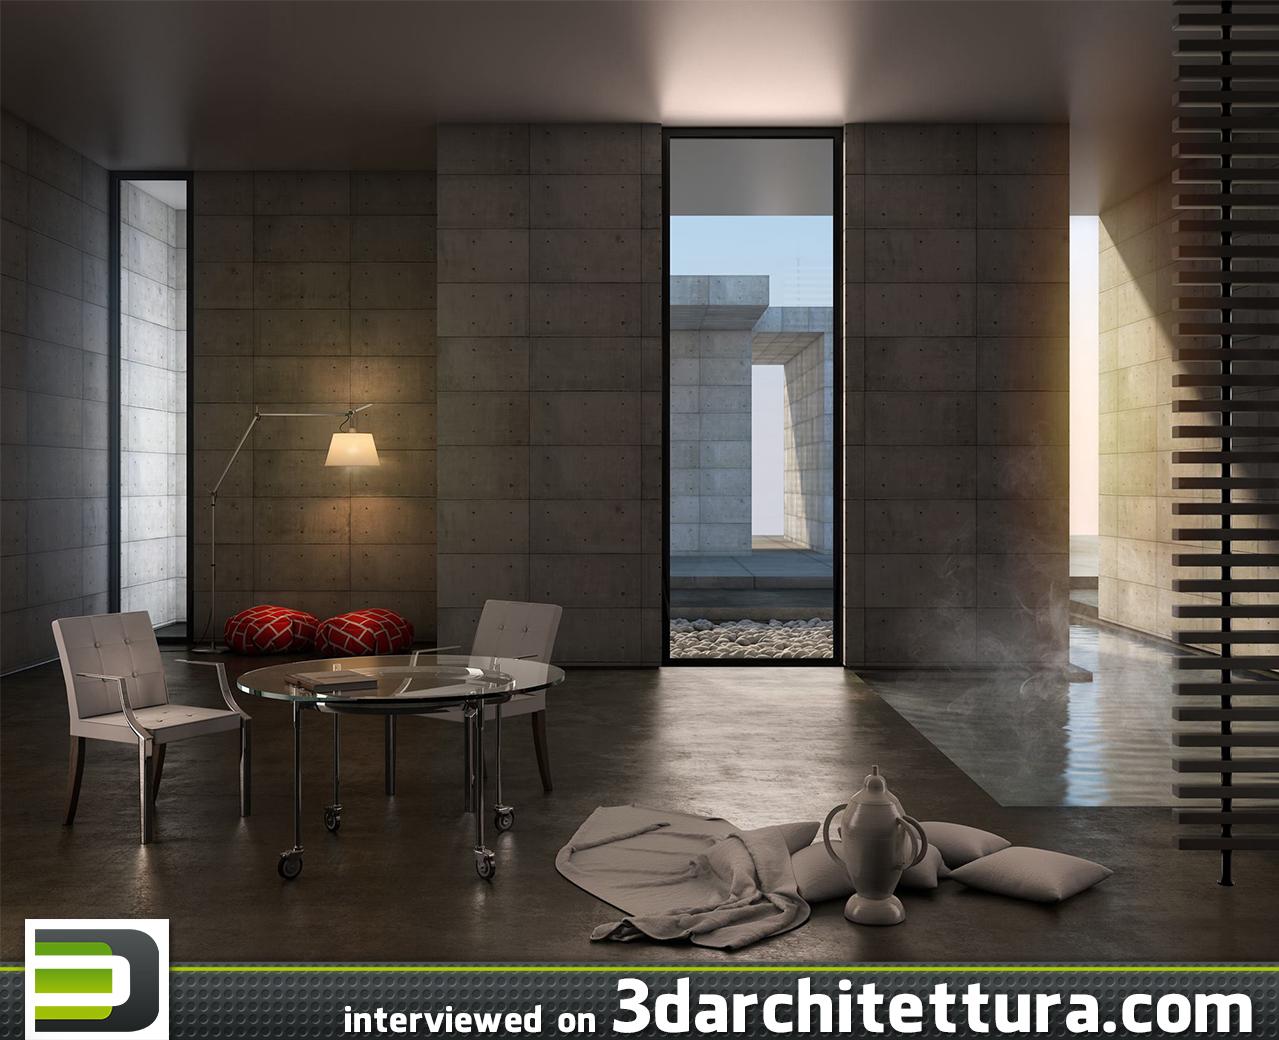 Alfonso Cucinelli interviewd for 3d Architettura: render, 3d, design, cg, architecture